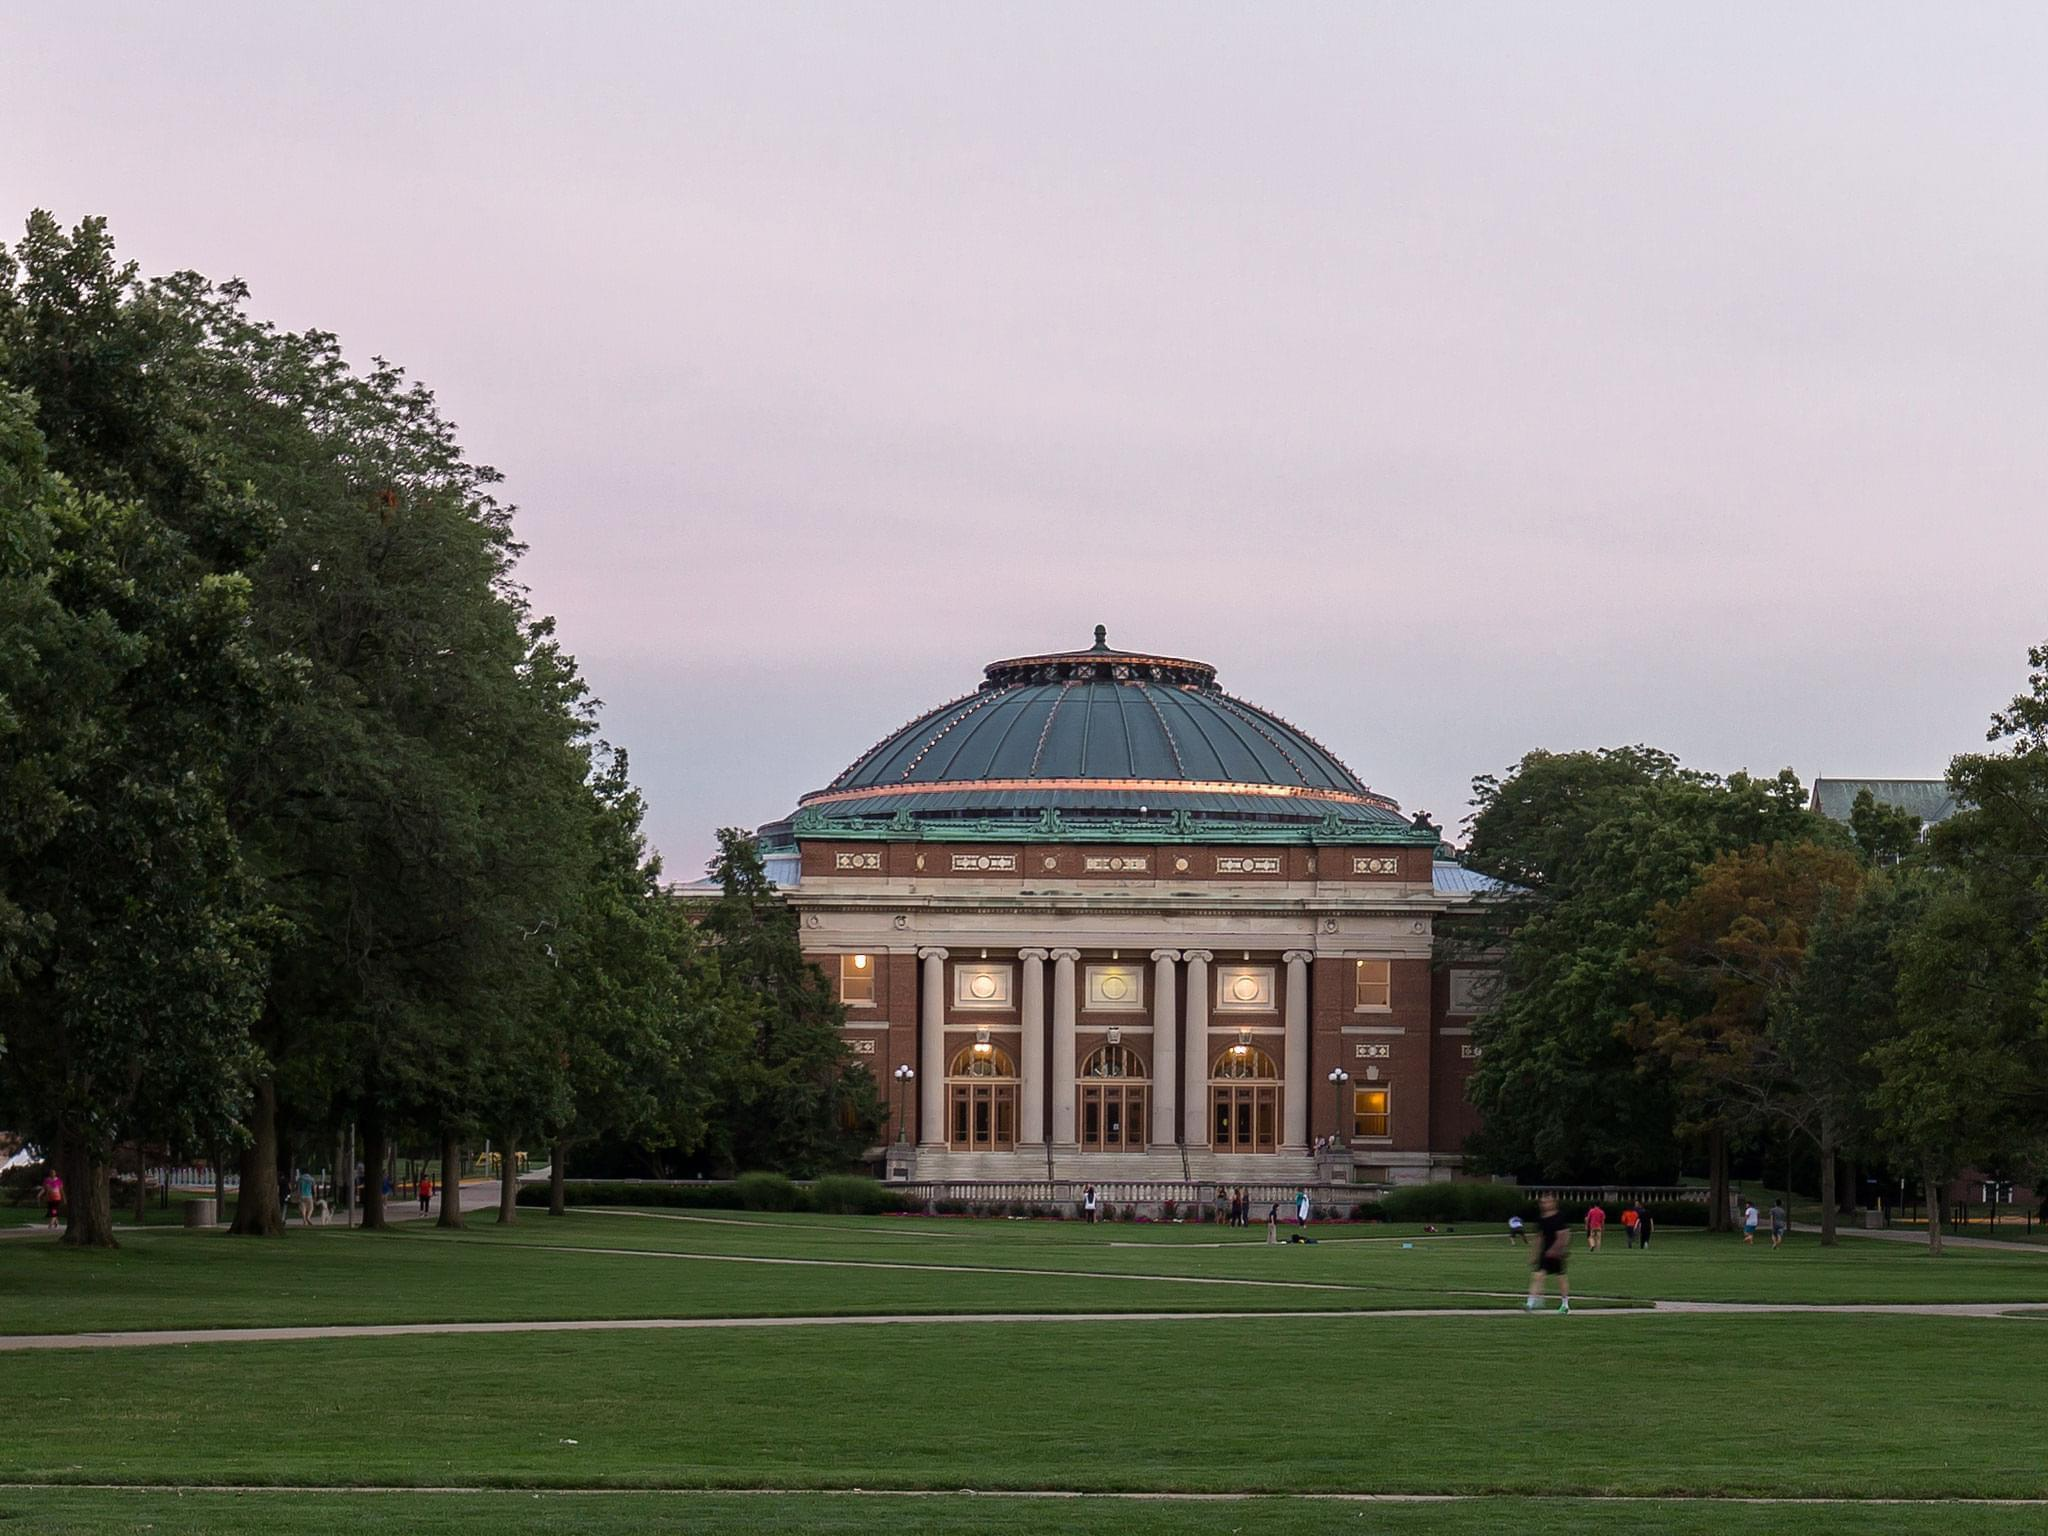 University of Illinois at Urbana Champaign Main Quad